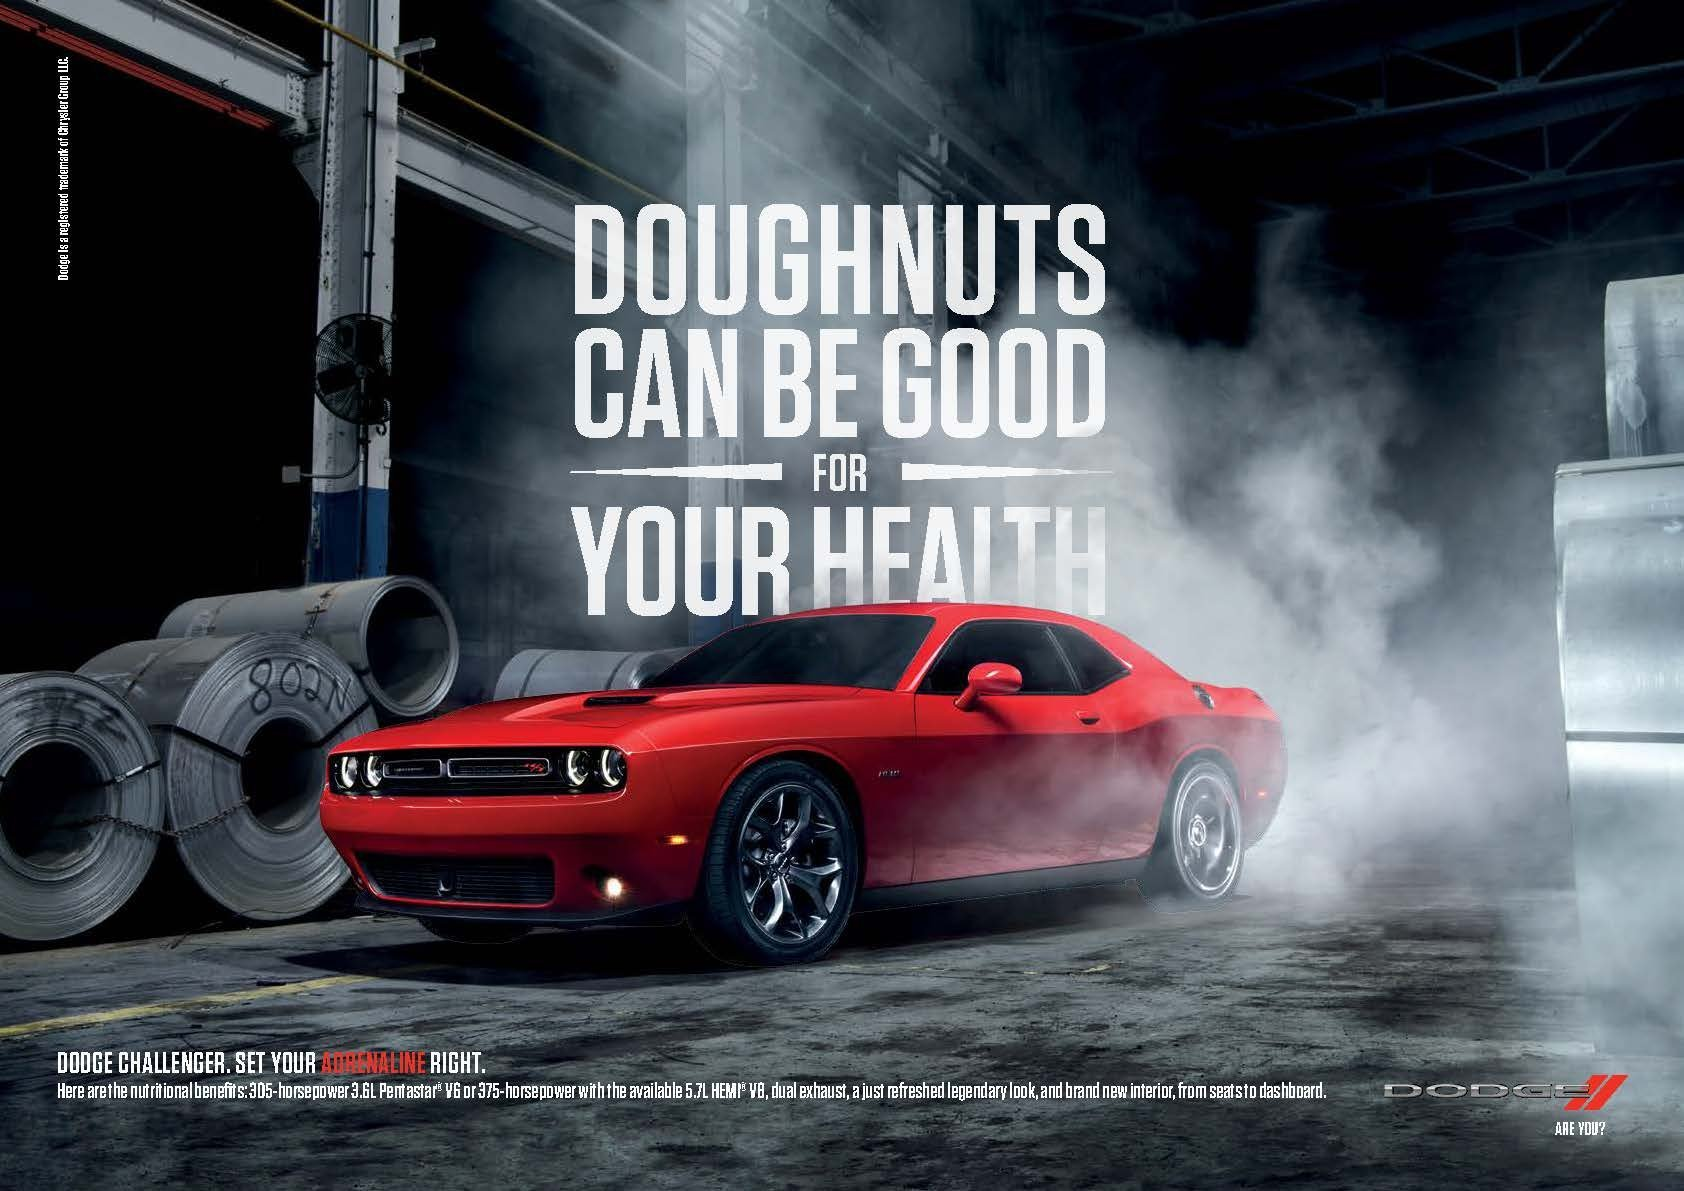 3082_DODGE_Challenger_Doughnuts_spread.jpg